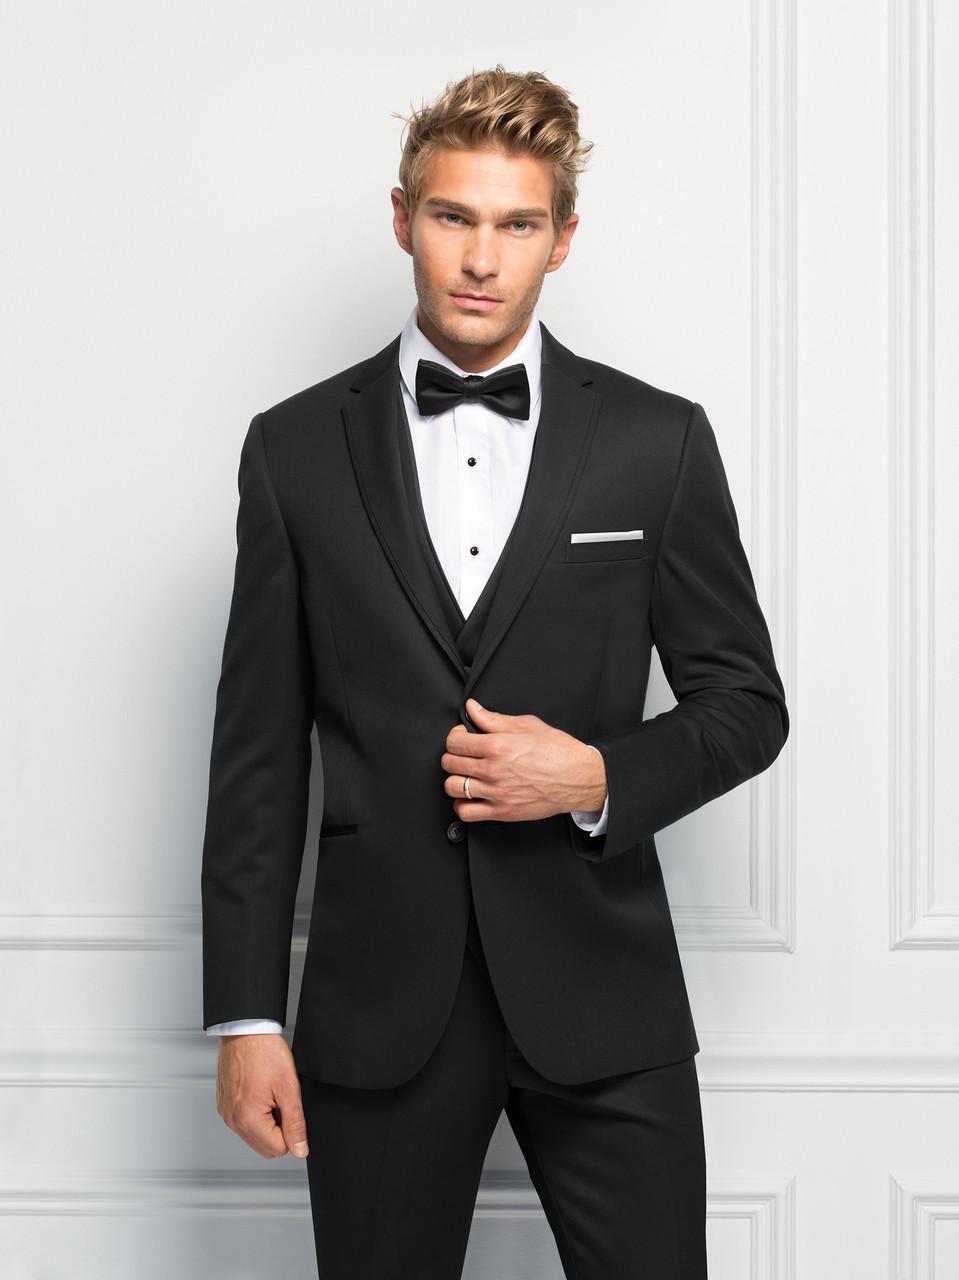 d137ab6b5986 Michael Kors Ultra Slim Fit Black Sterling Wedding Suit Style J 471. Image  1. Loading zoom